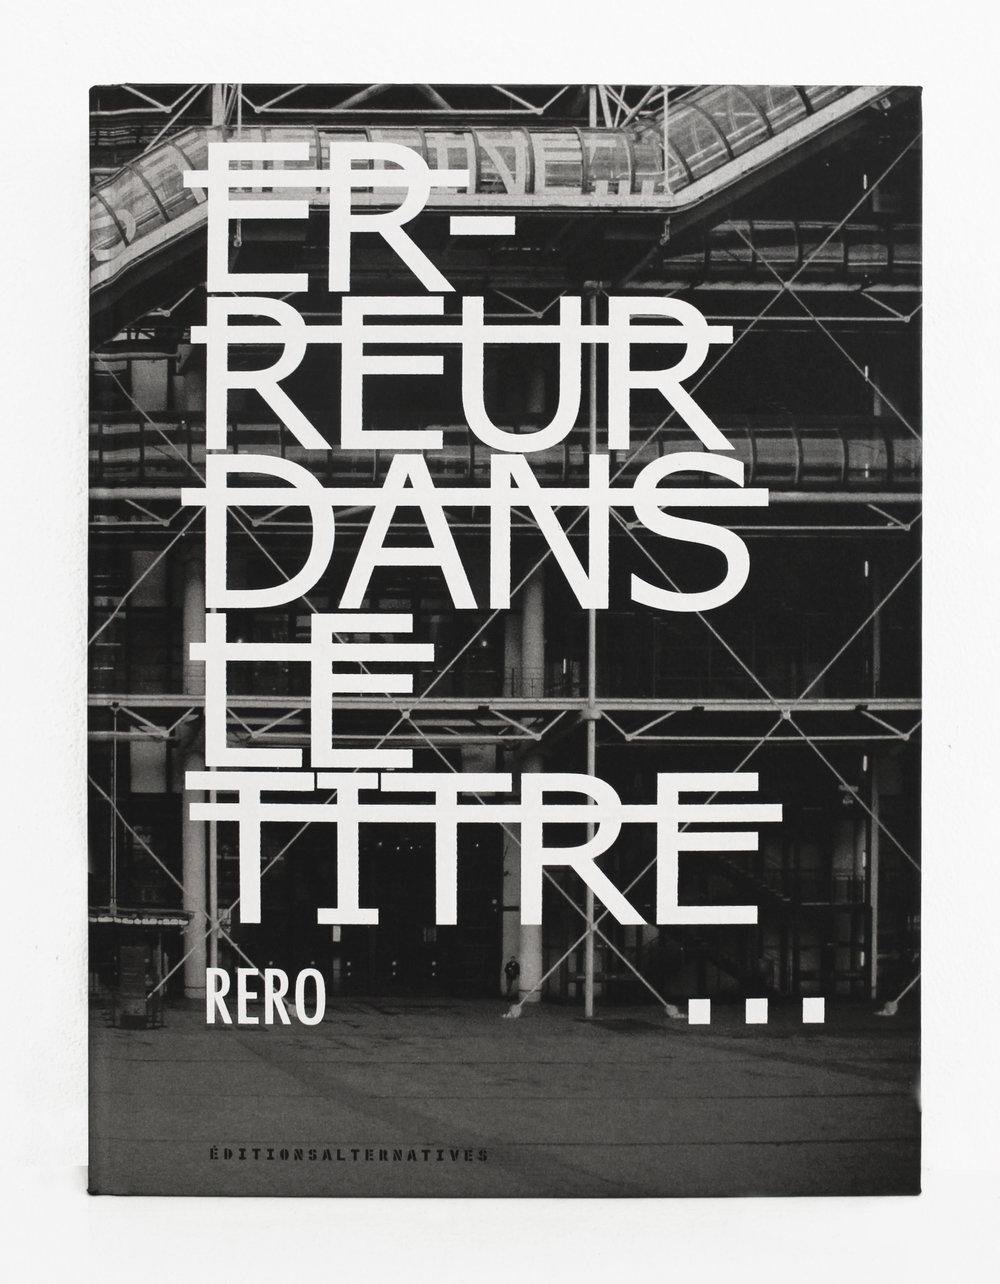 bookstore-erreur-1.jpg